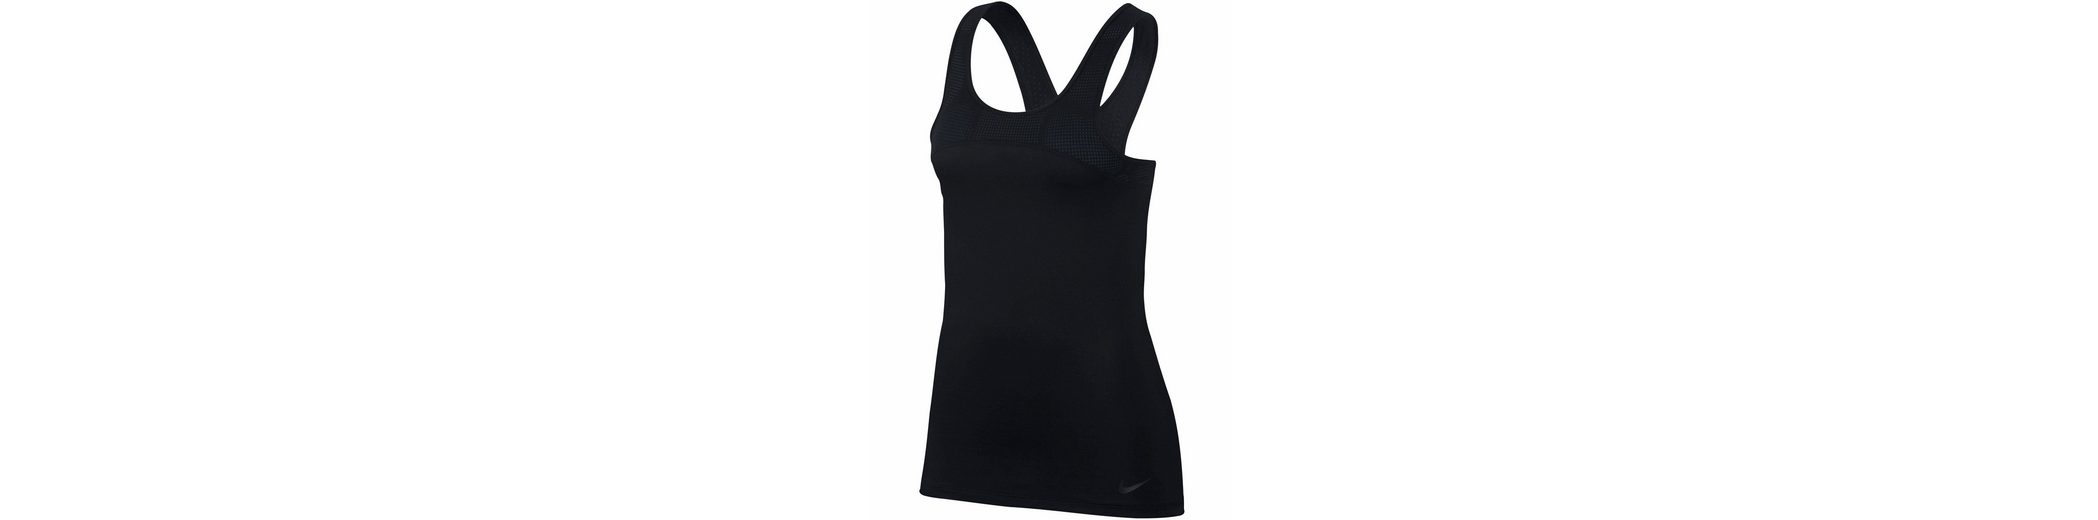 Nike Funktionstop WOMEN NIKE PRO HPRCL TANK Verkaufsauftrag Großhandelspreis Günstig Online Freies Verschiffen Der Offizielle Website Billig Bestseller FDQrtqBQC